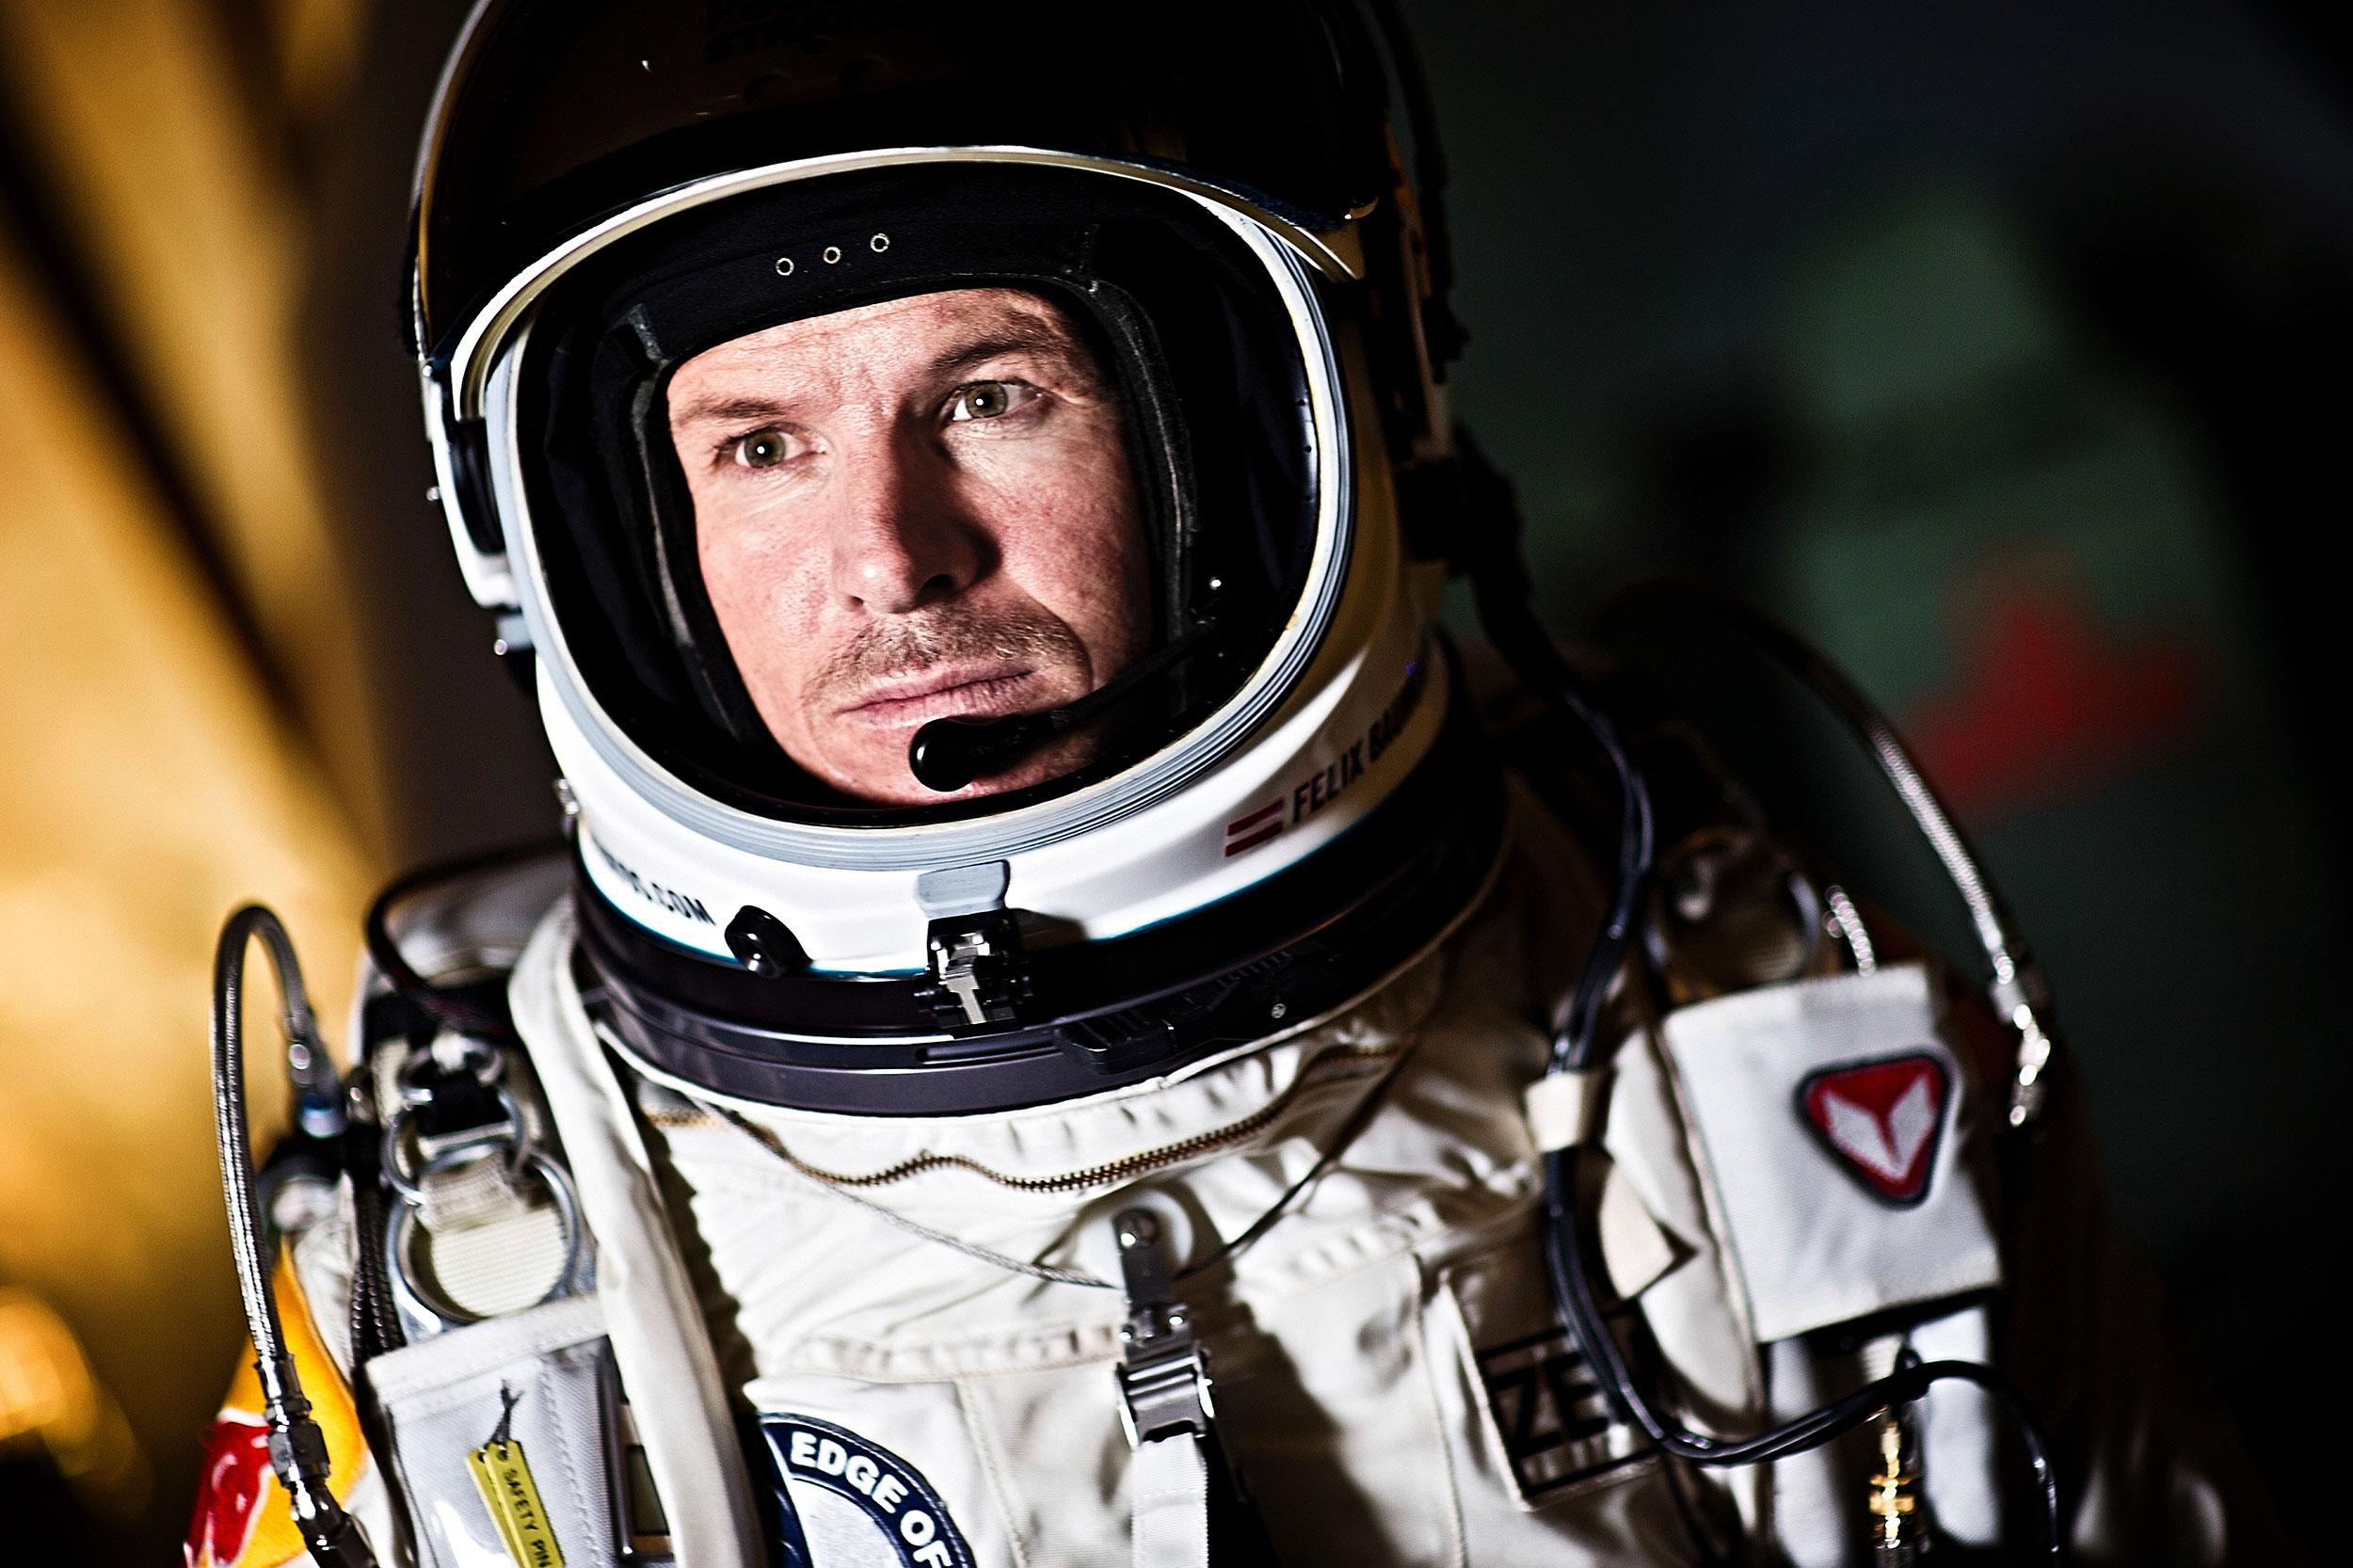 Felix Baumgartner - Red Bull Stratos